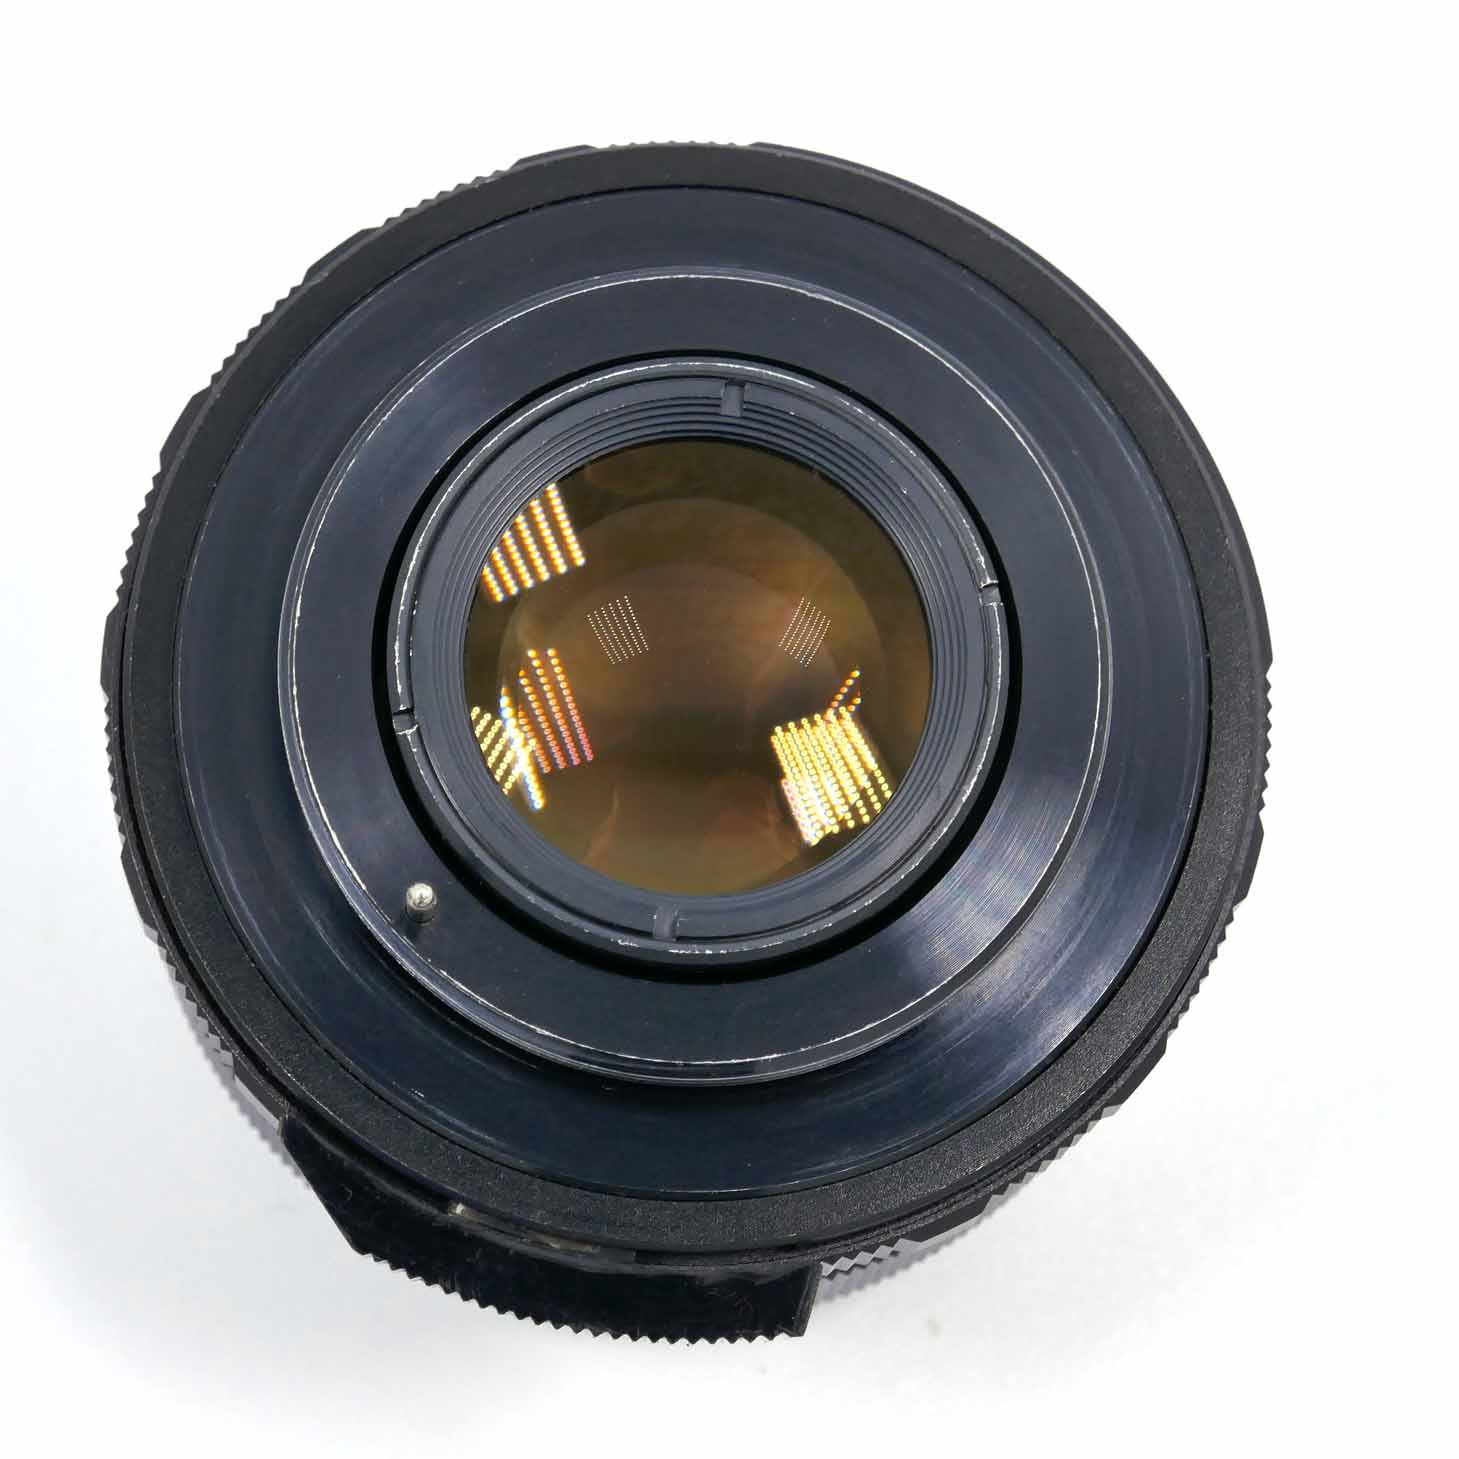 clean-cameras-Auto-Mamiya-Sekor-55mm-1.8-M4202